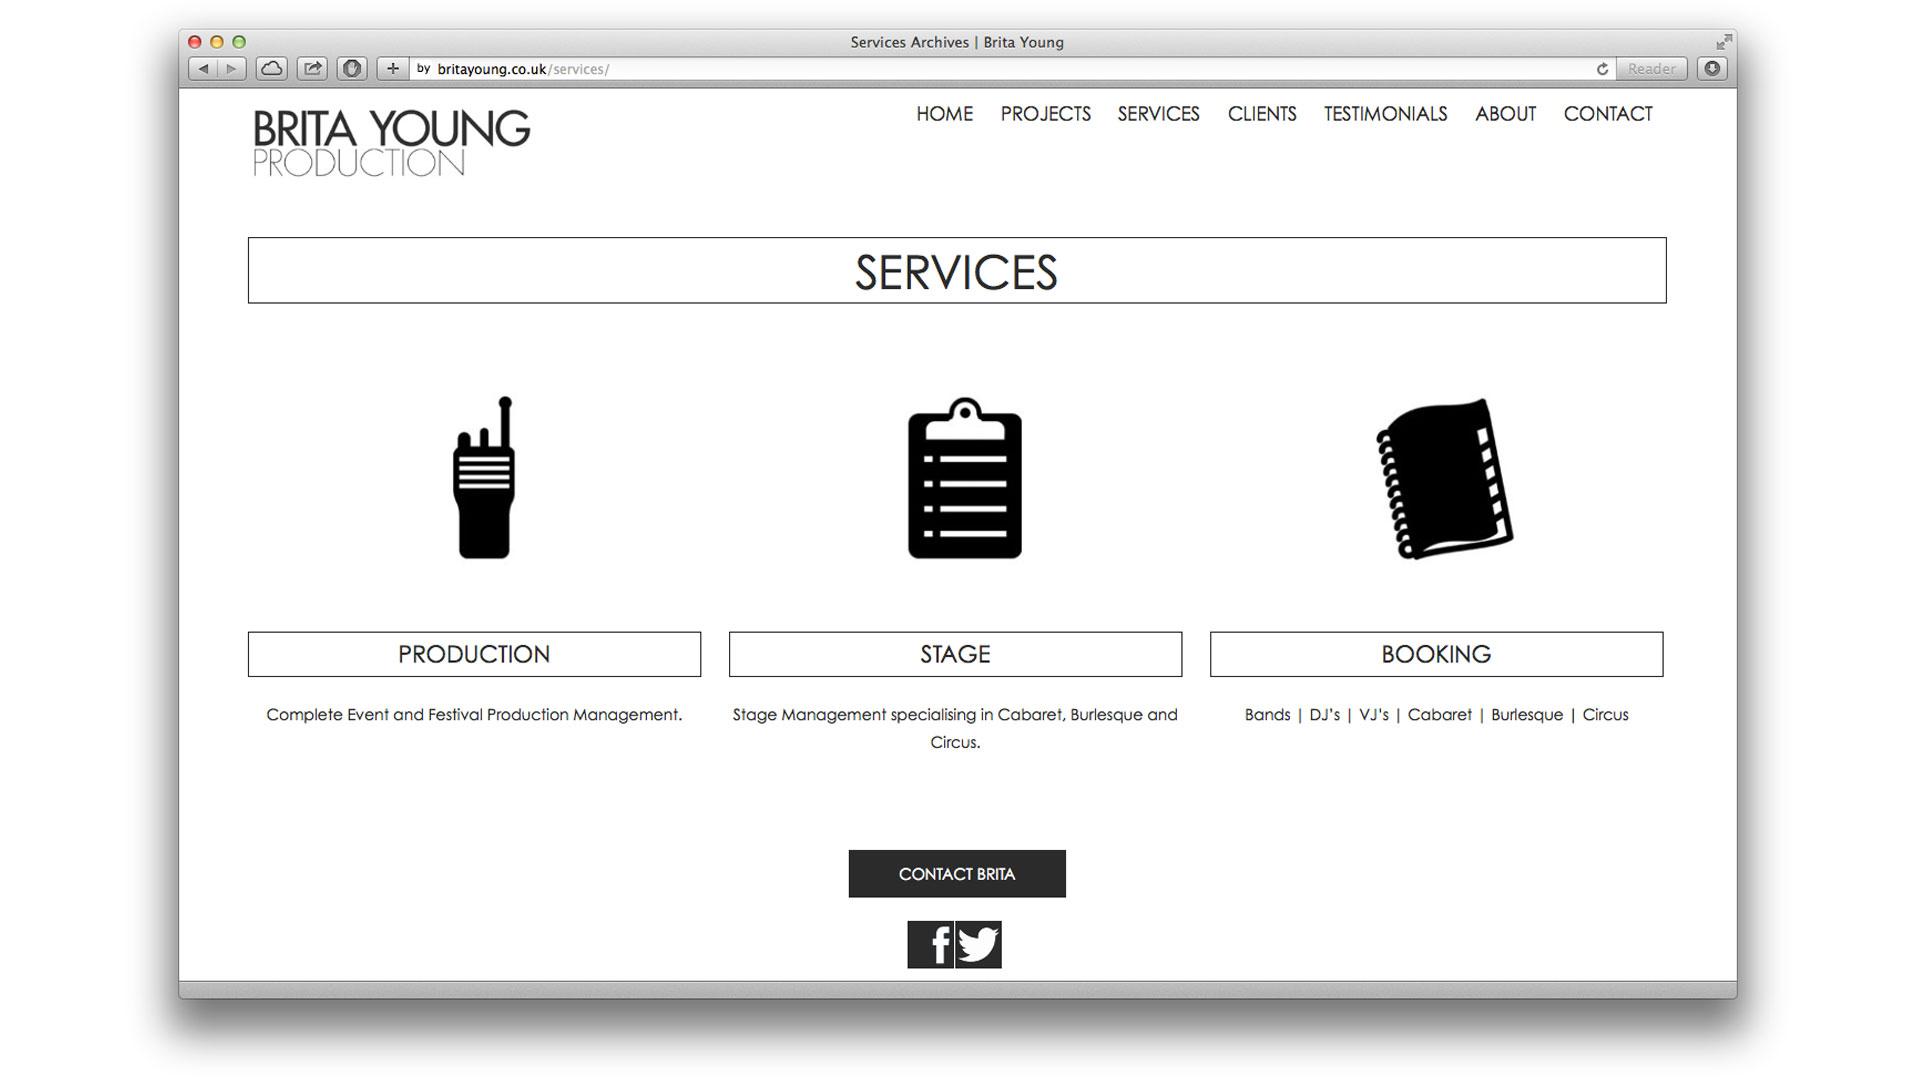 Brita Young Services Page